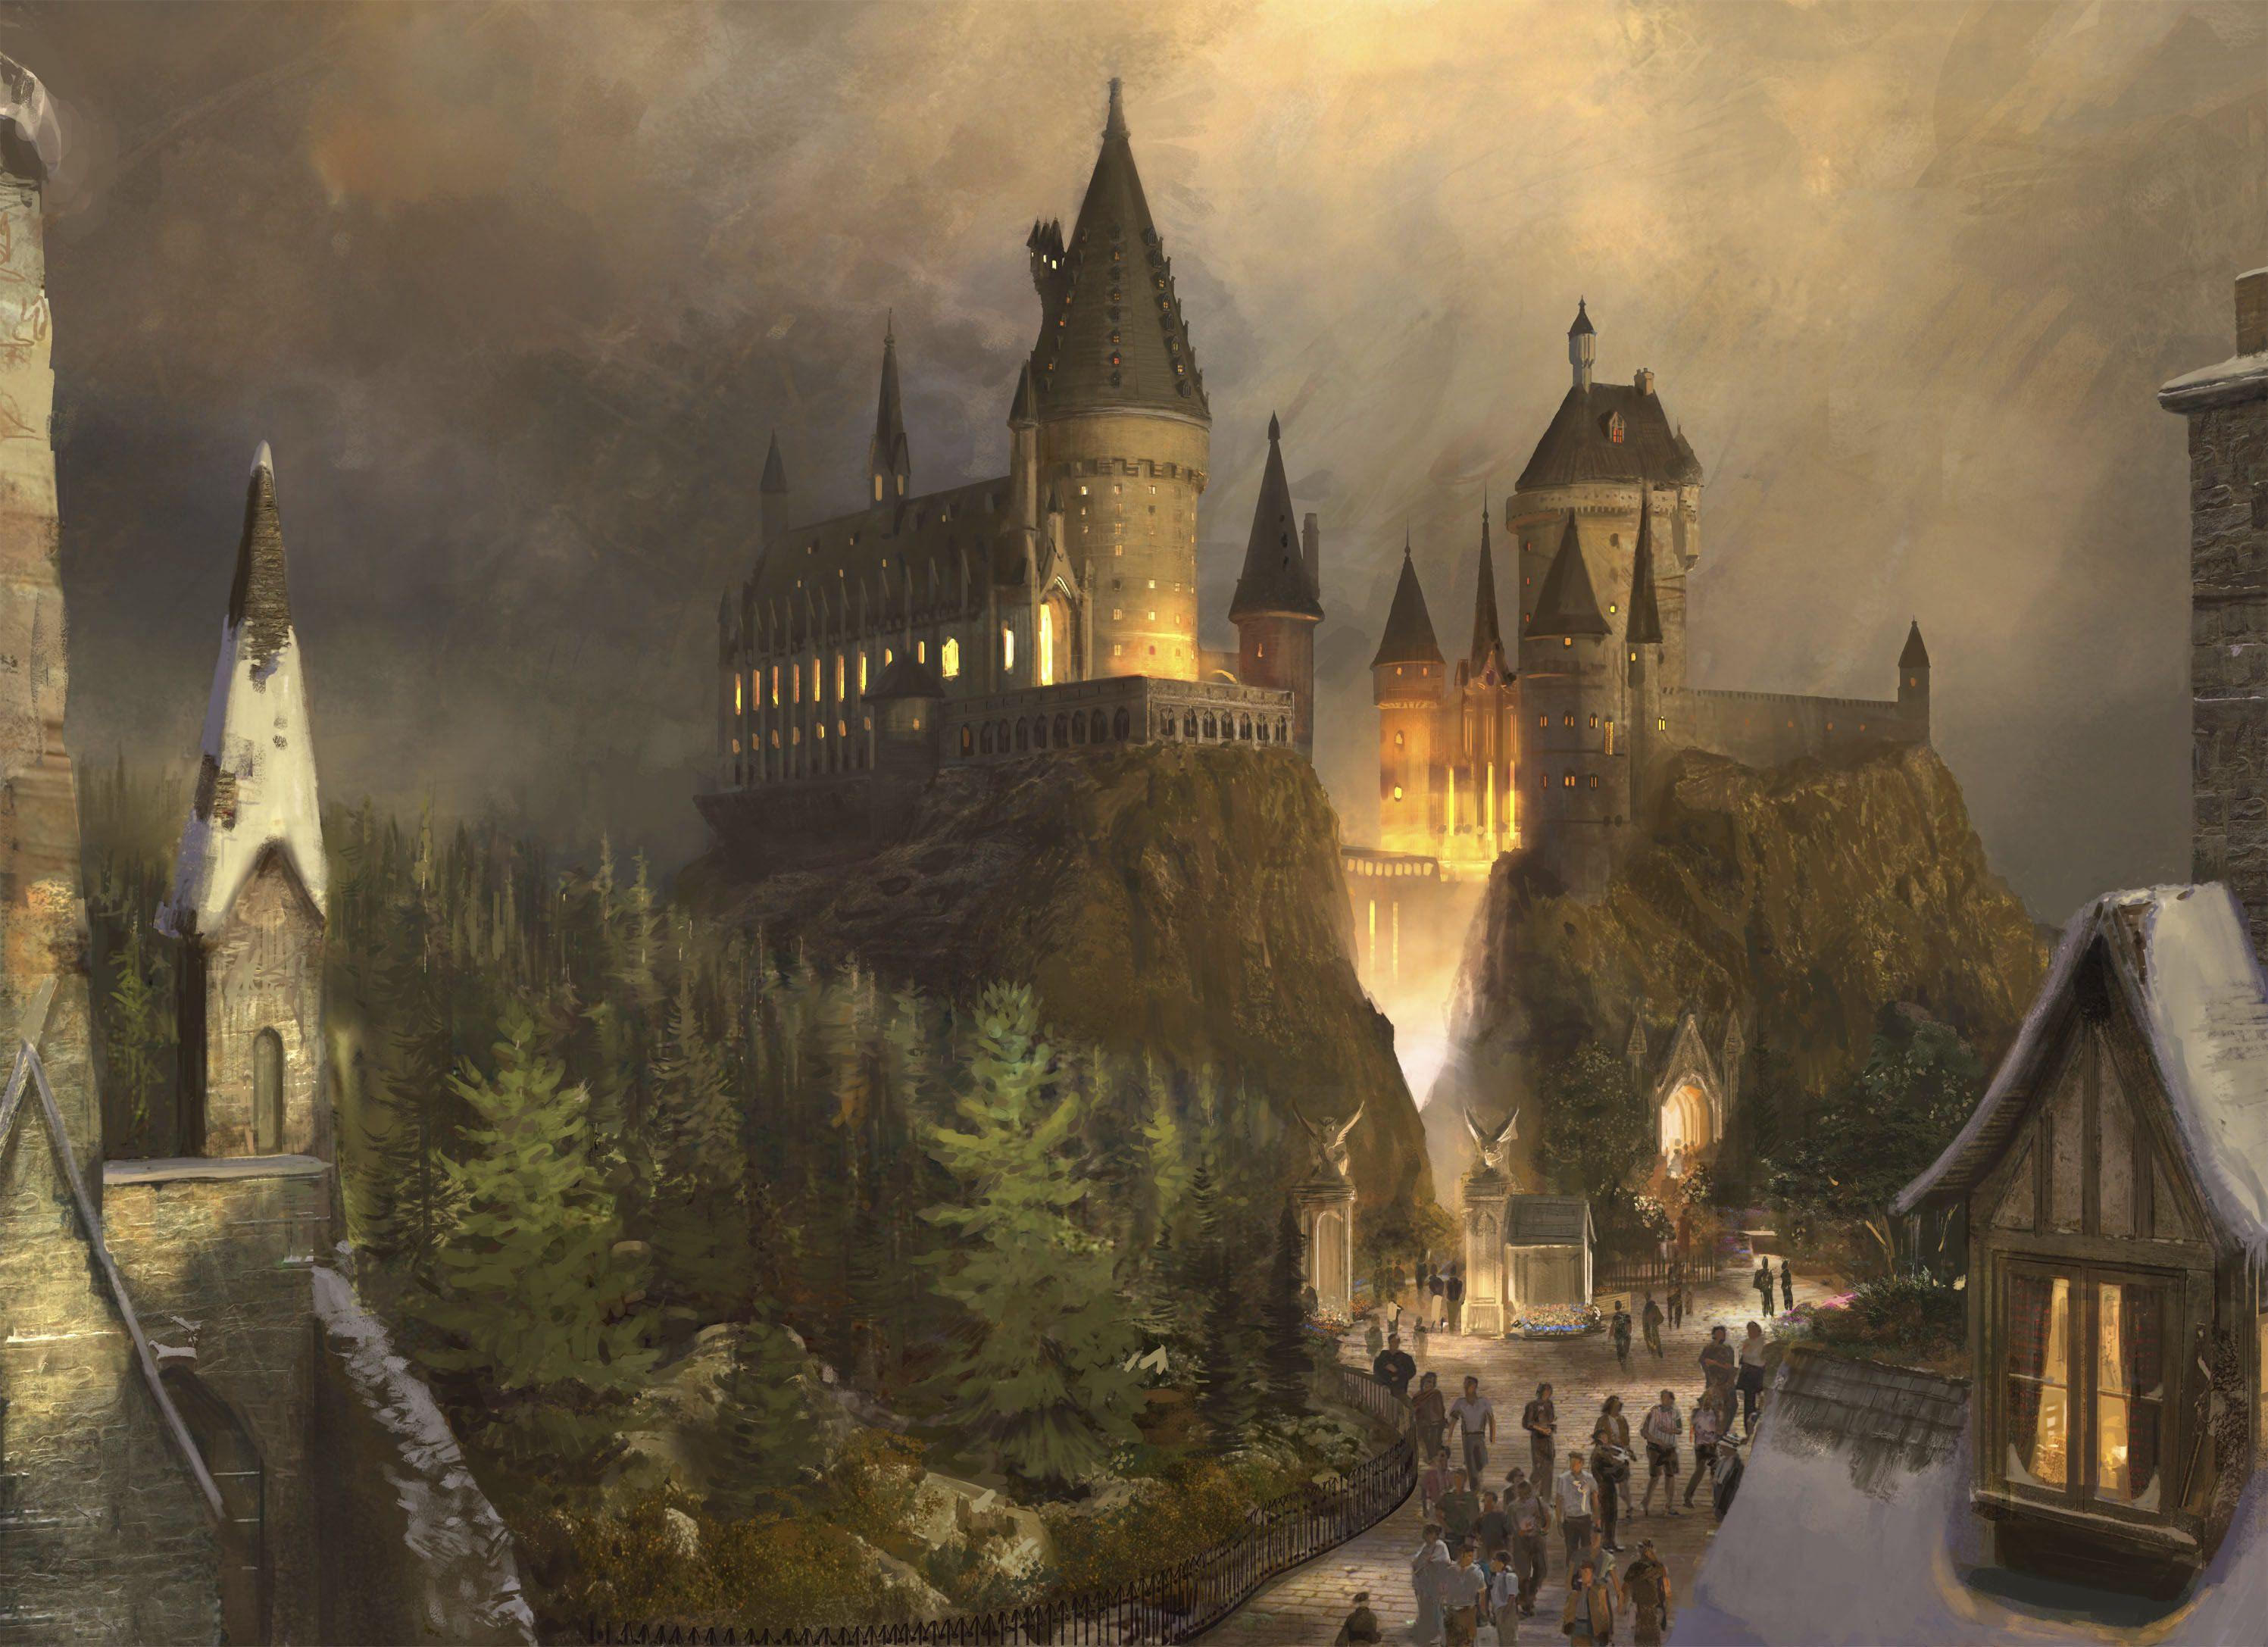 Most Inspiring Wallpaper Harry Potter Fanart - ed986c4b0a162c0d7370847178605ff4  Trends_429177.jpg